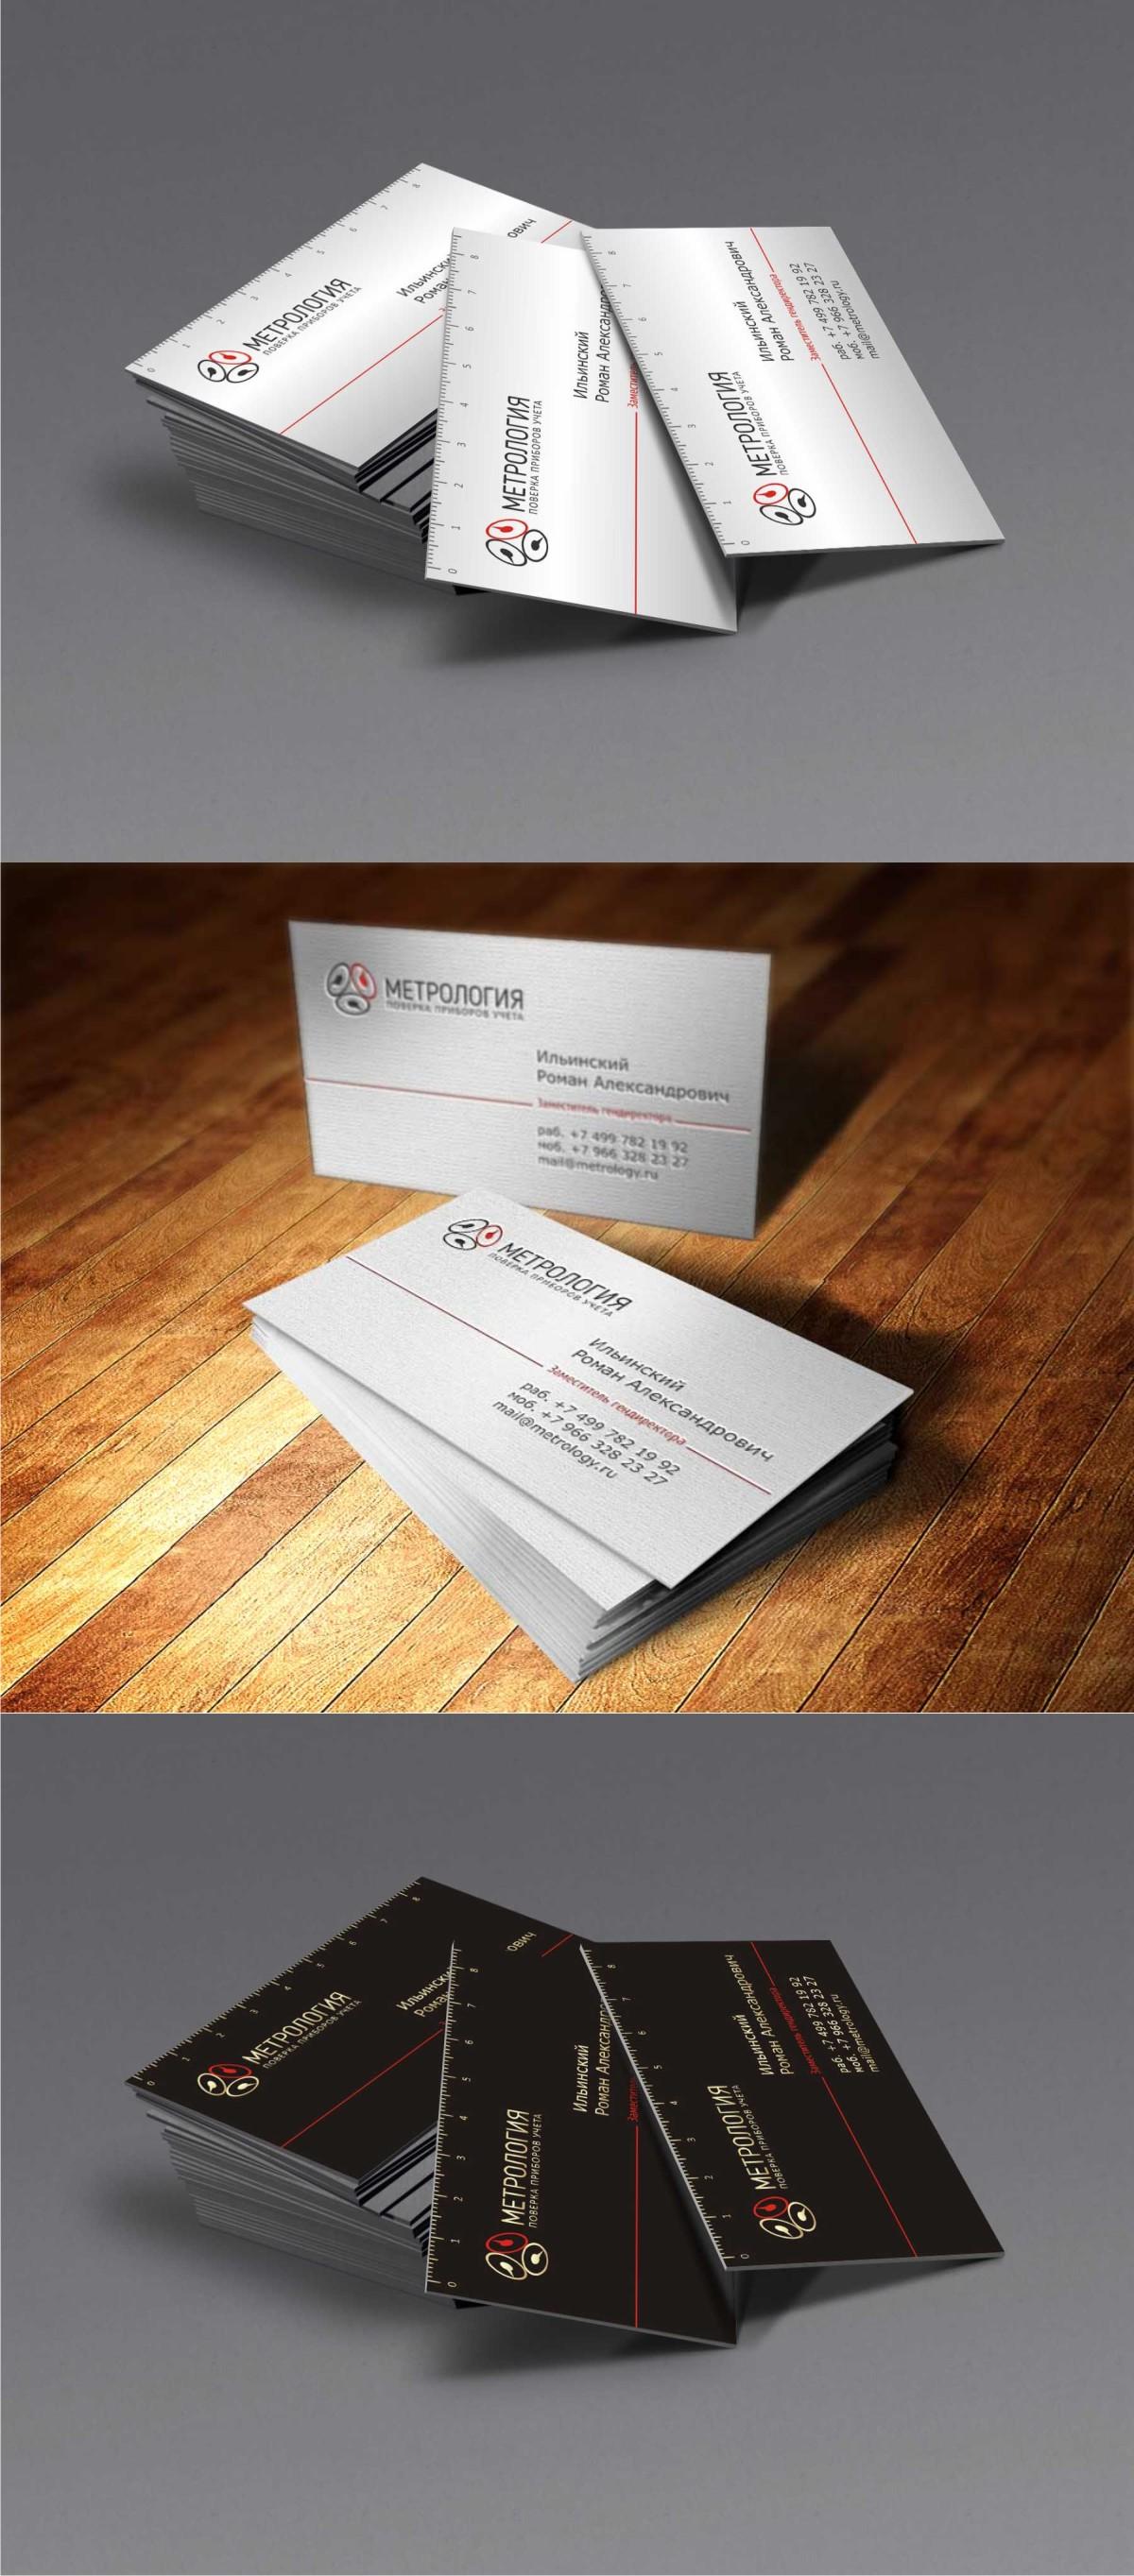 Разработать логотип, визитку, фирменный бланк. фото f_00458f4d82edf2dd.jpg